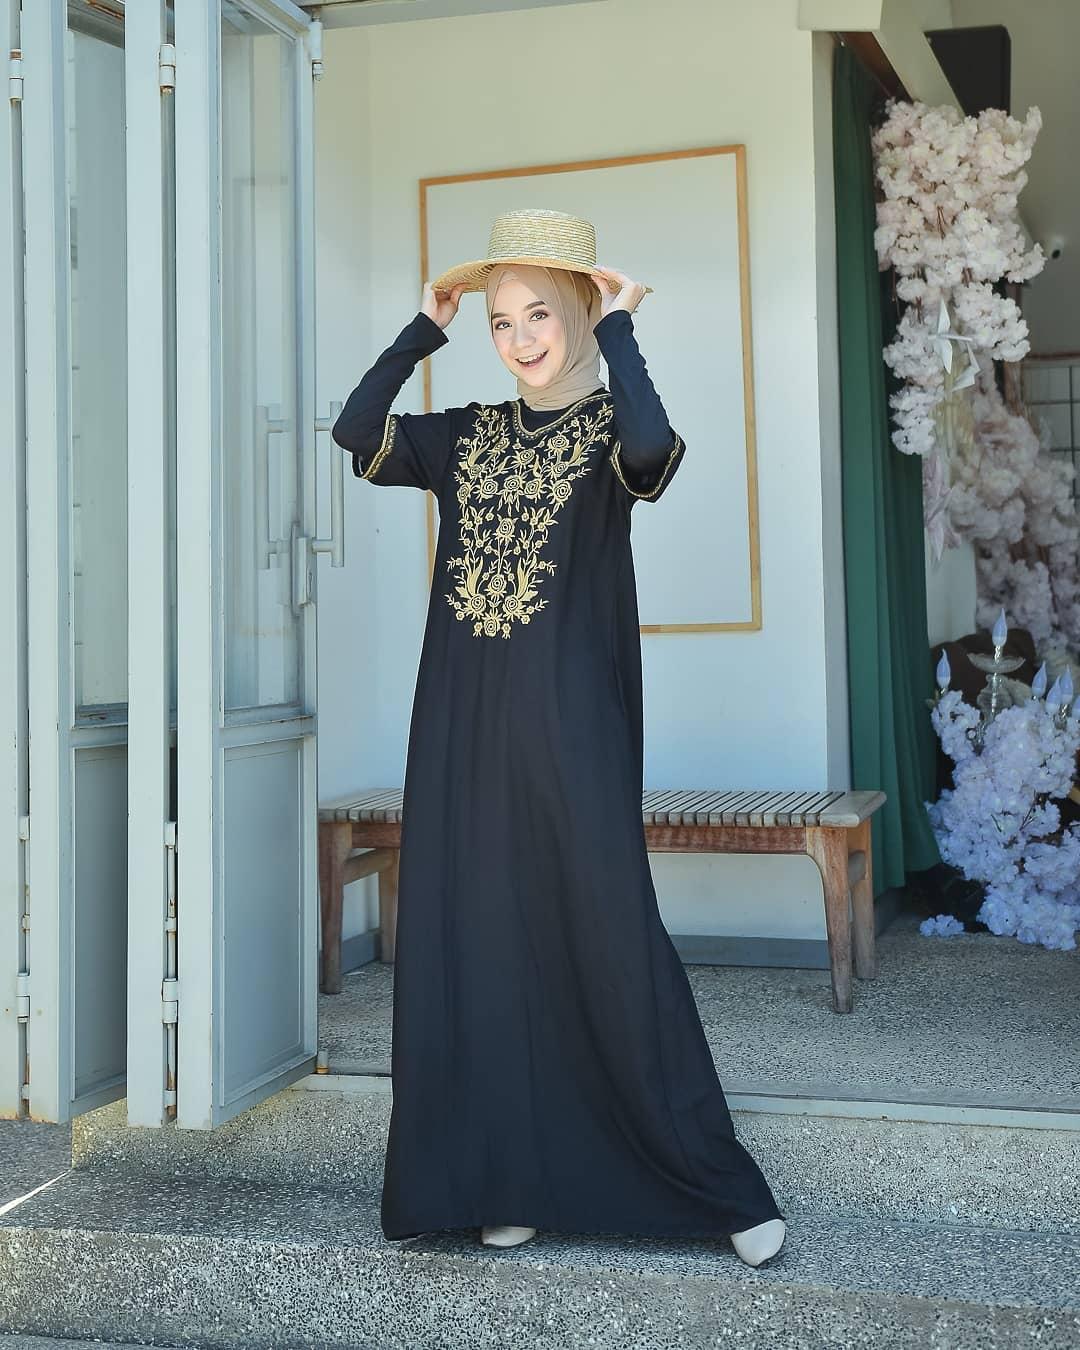 Sasya.Clo - Zoya Kaftan / Baju Gamis Wanita Terbaru 11 / Kaftan Remaja  Modern / Busana Muslim Wanita Terbaru / Fashion Wanita Muslim / Baju Wanita